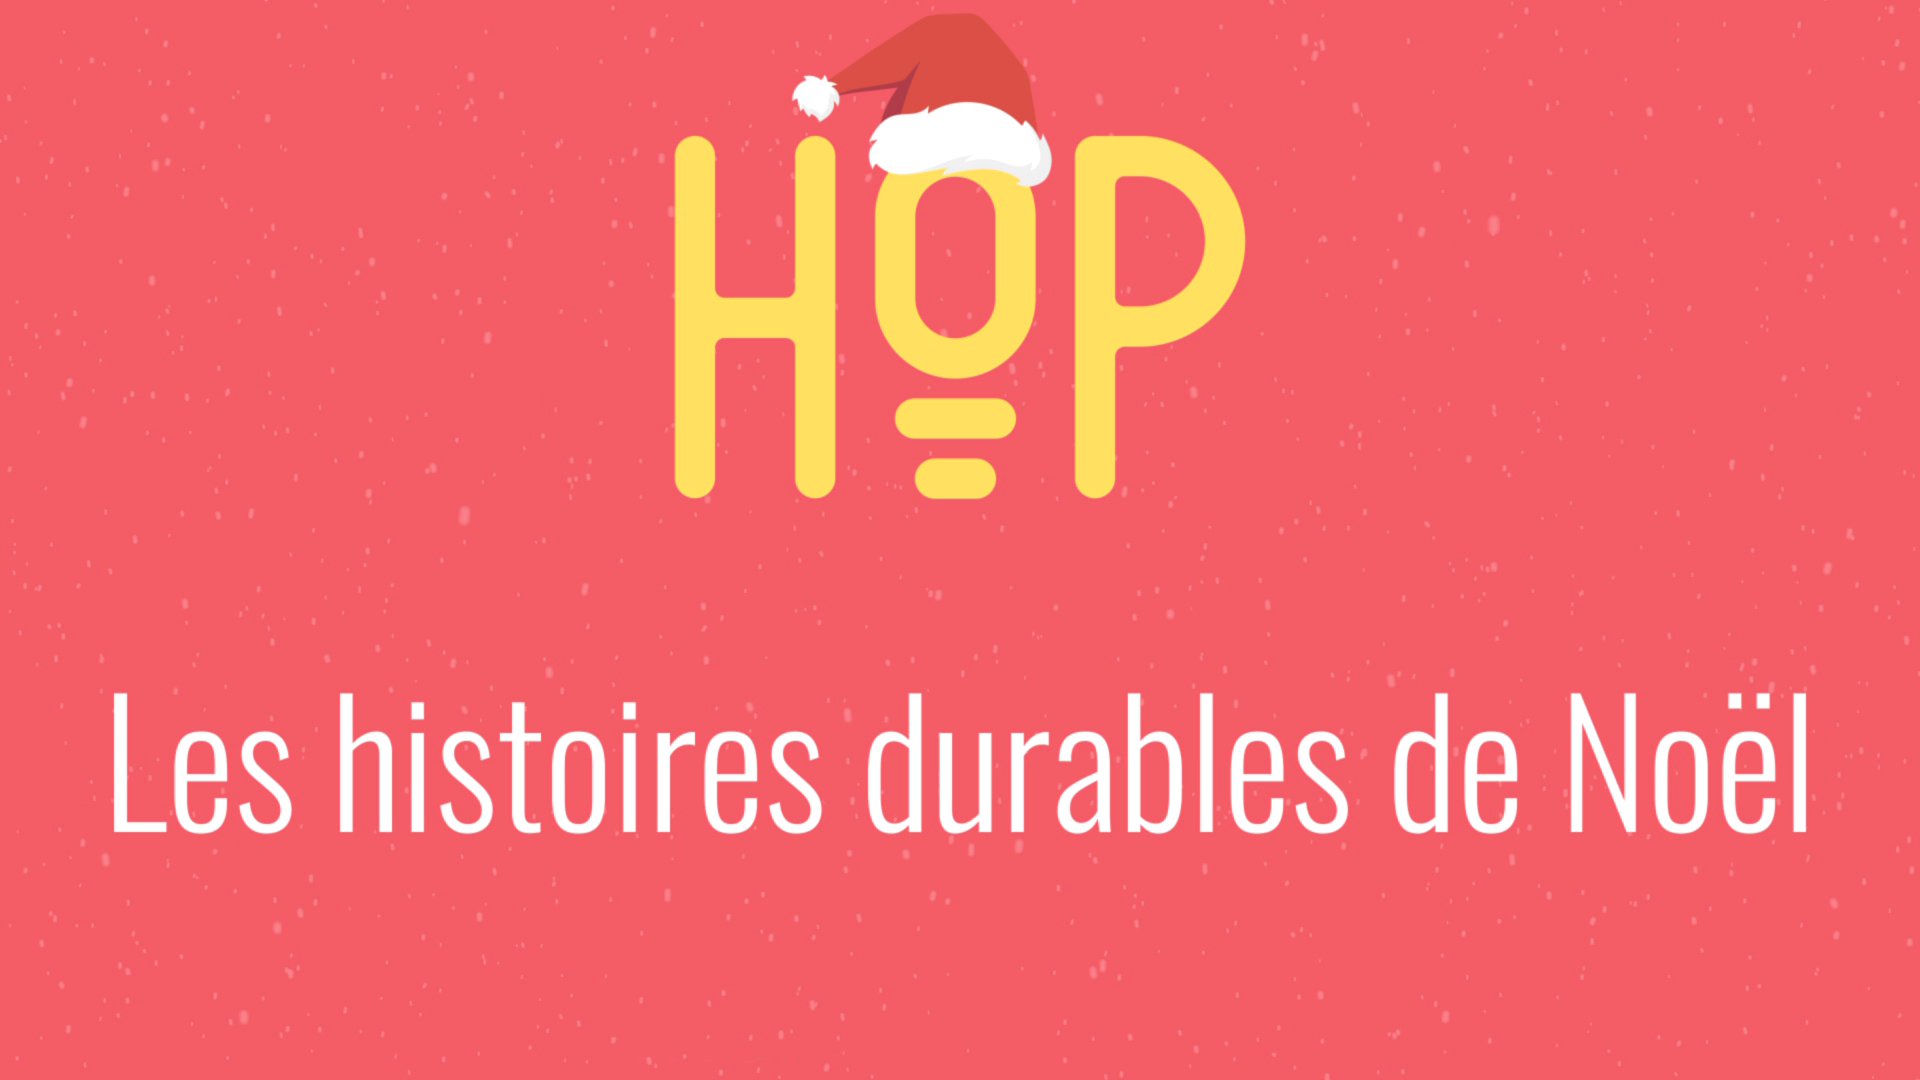 #HistoiresDurablesdeNoël soutenez HOP !